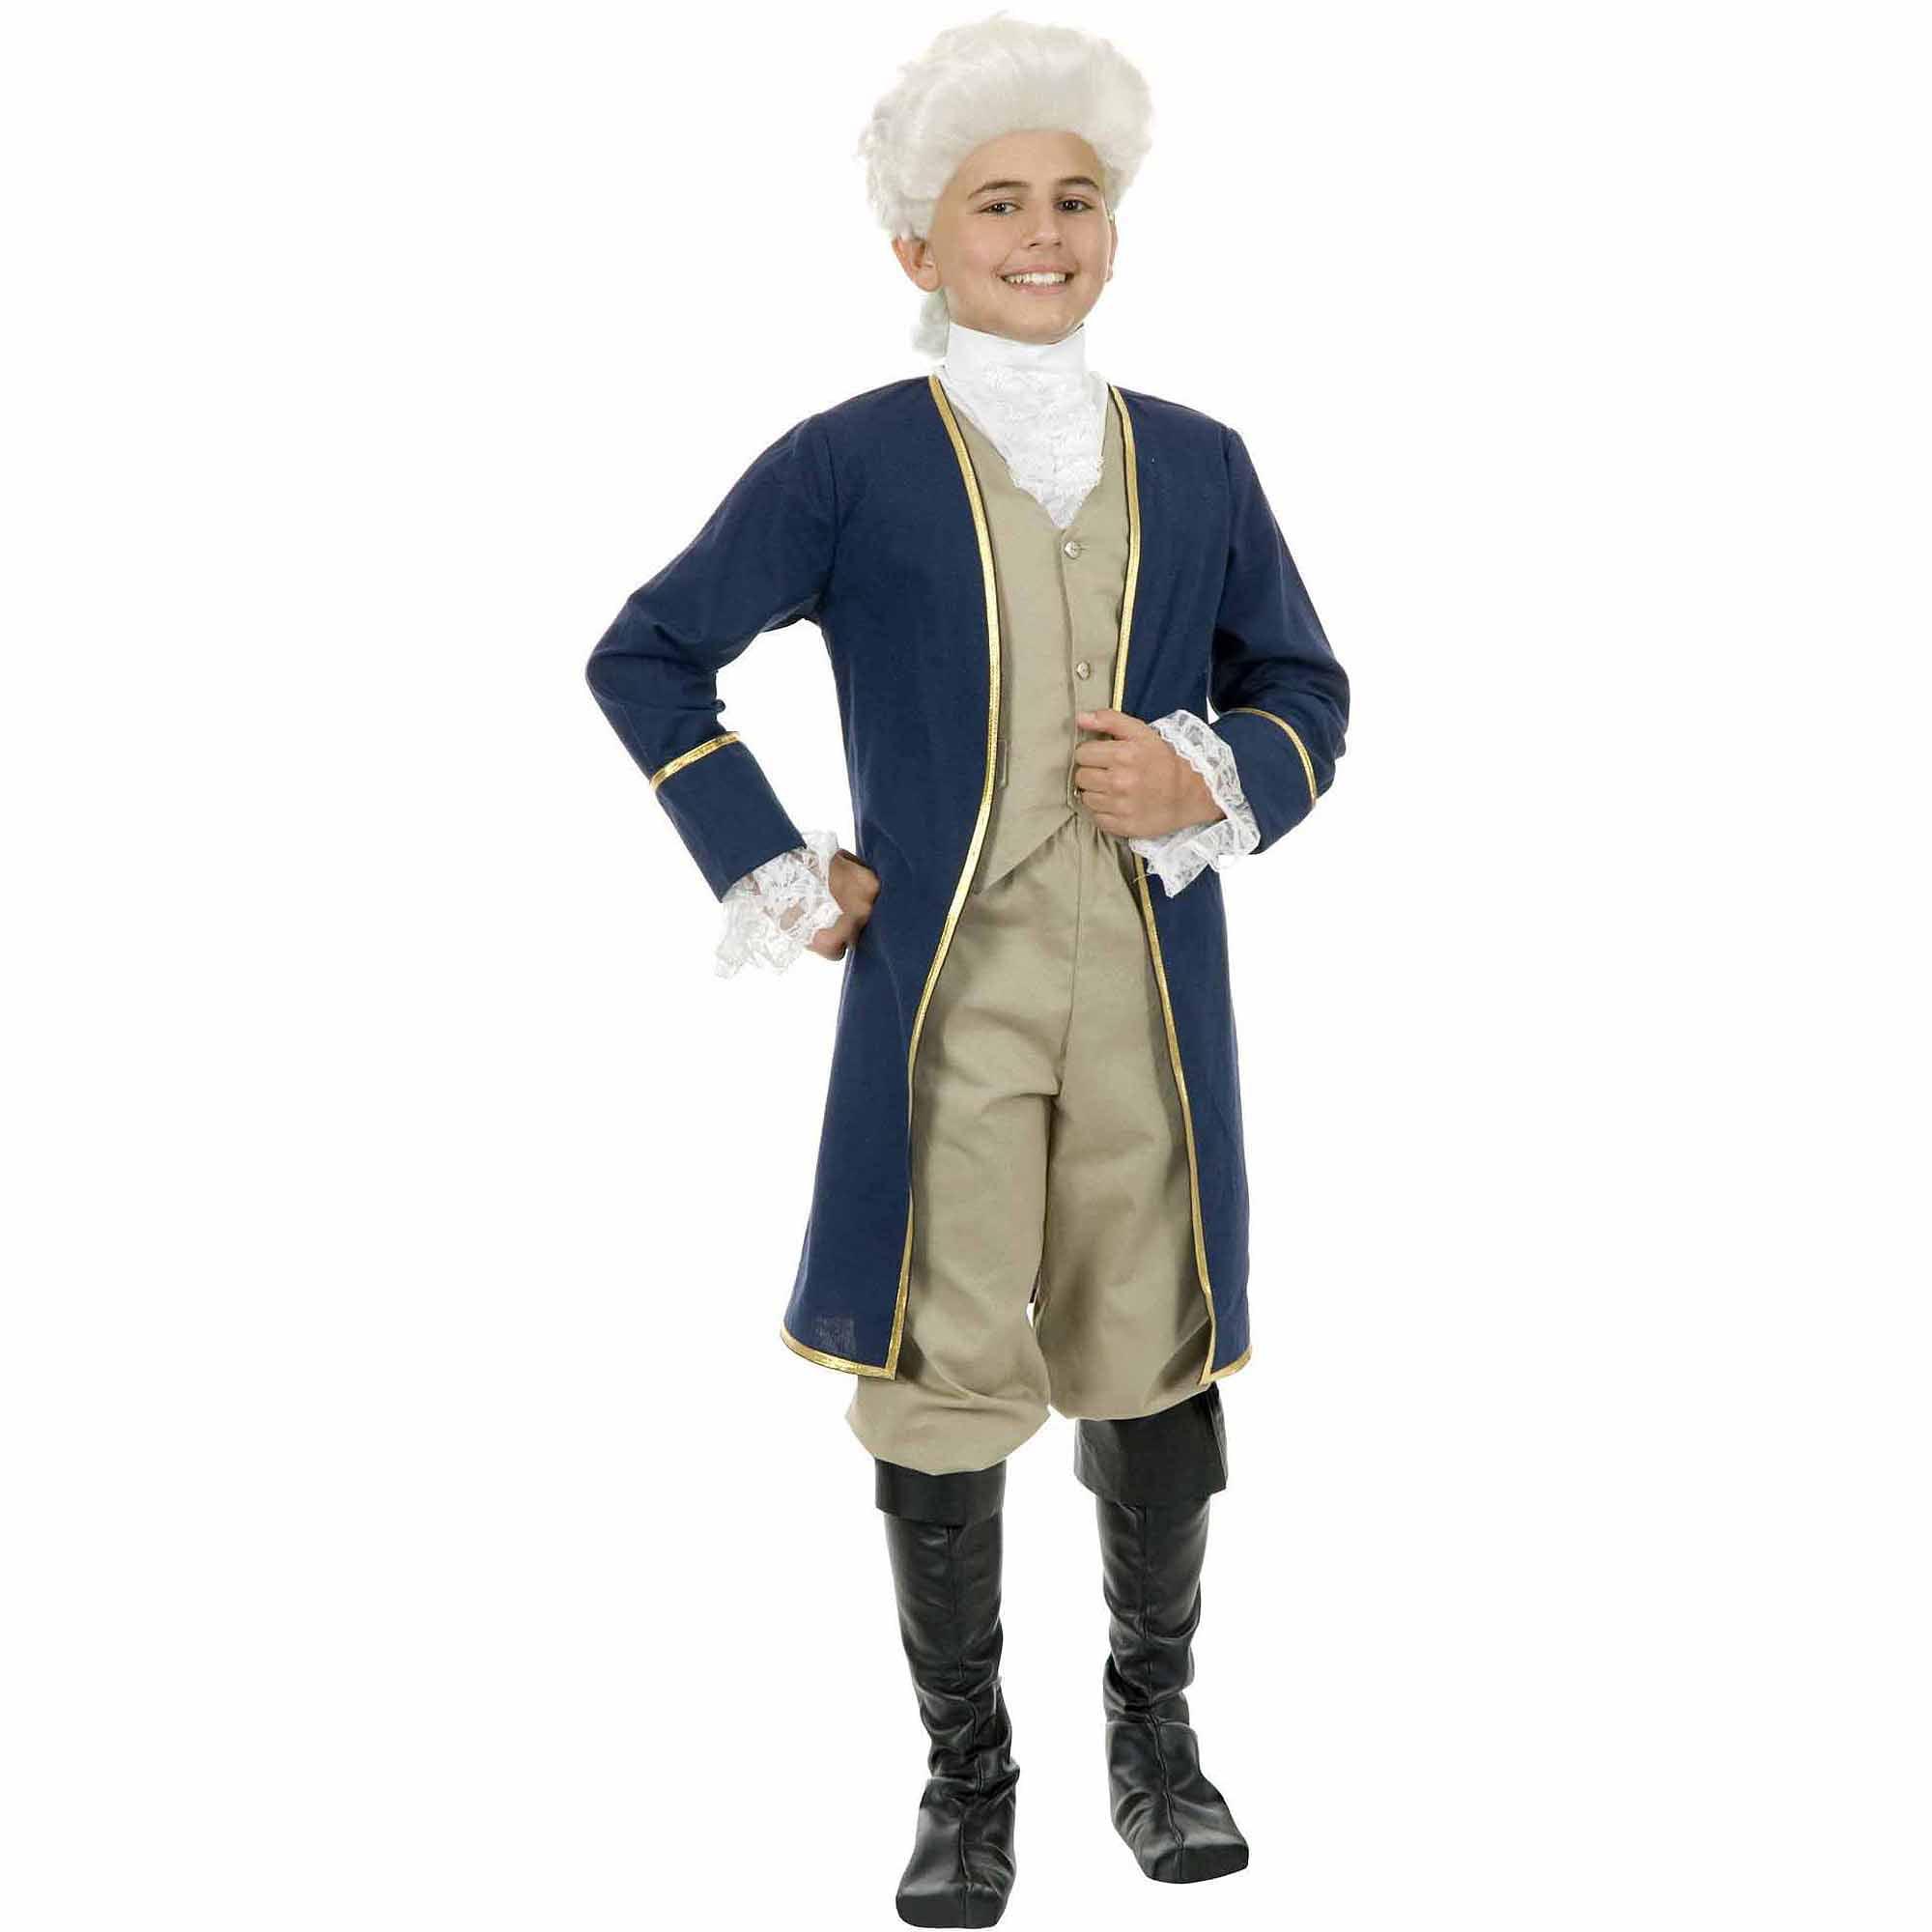 george washington child halloween costume - walmart